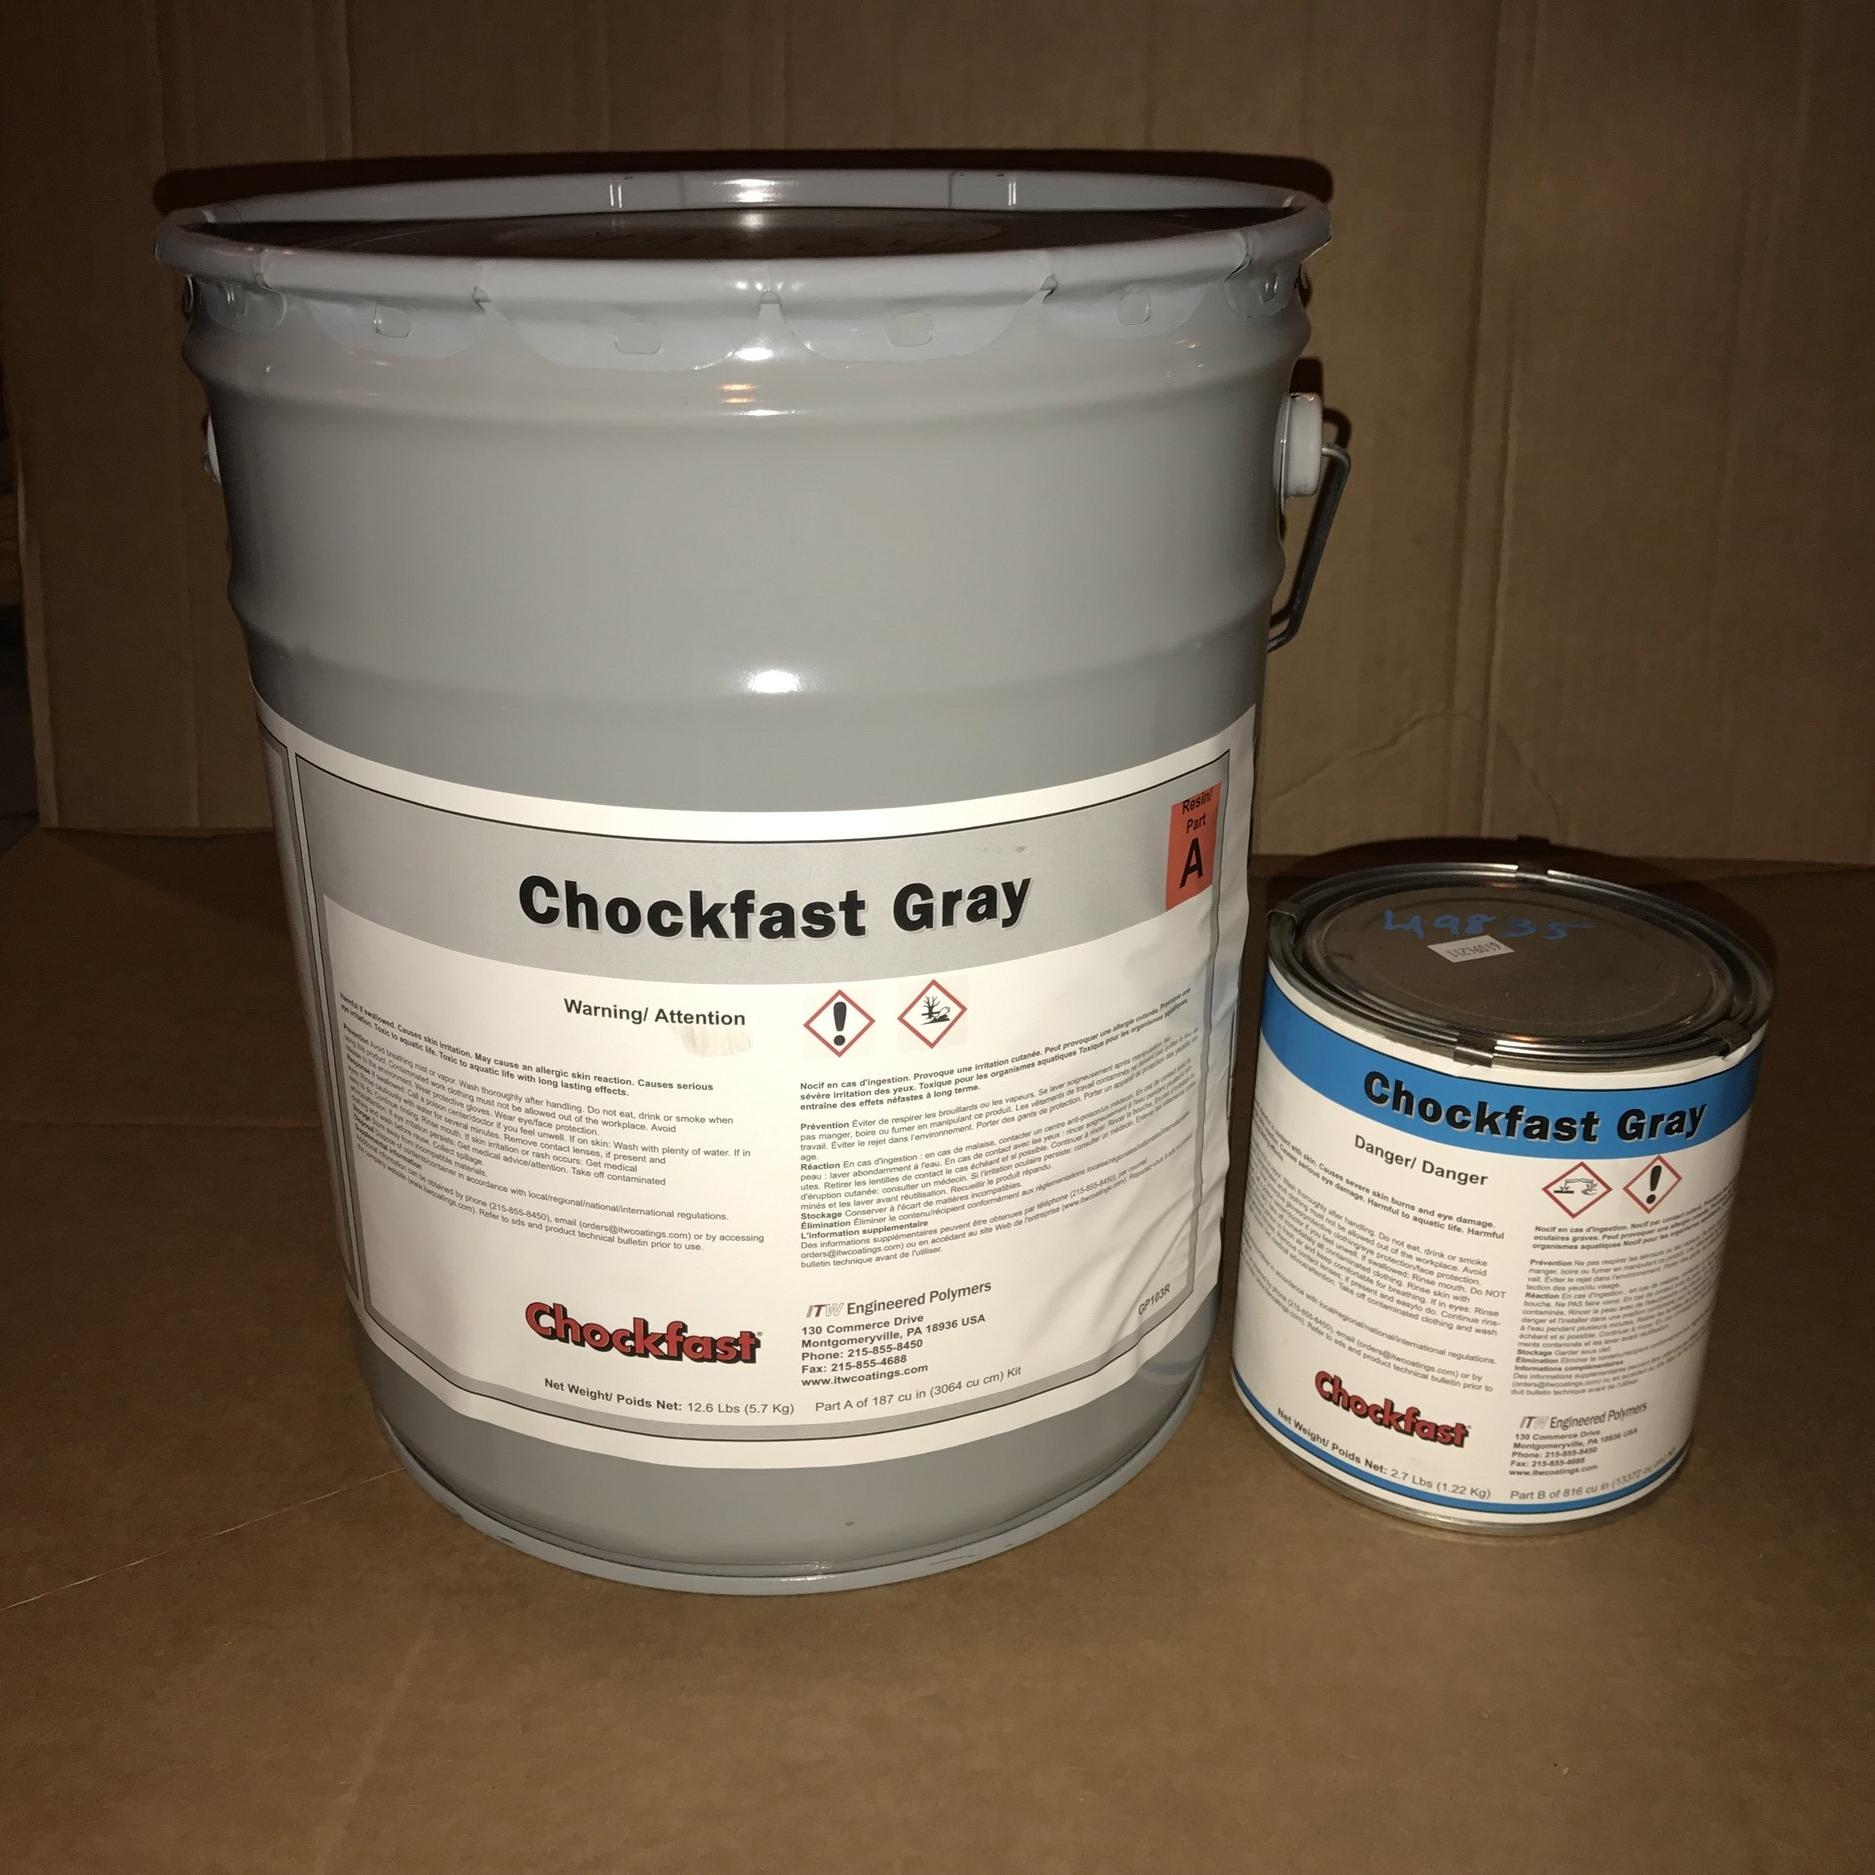 Chockfast Gray